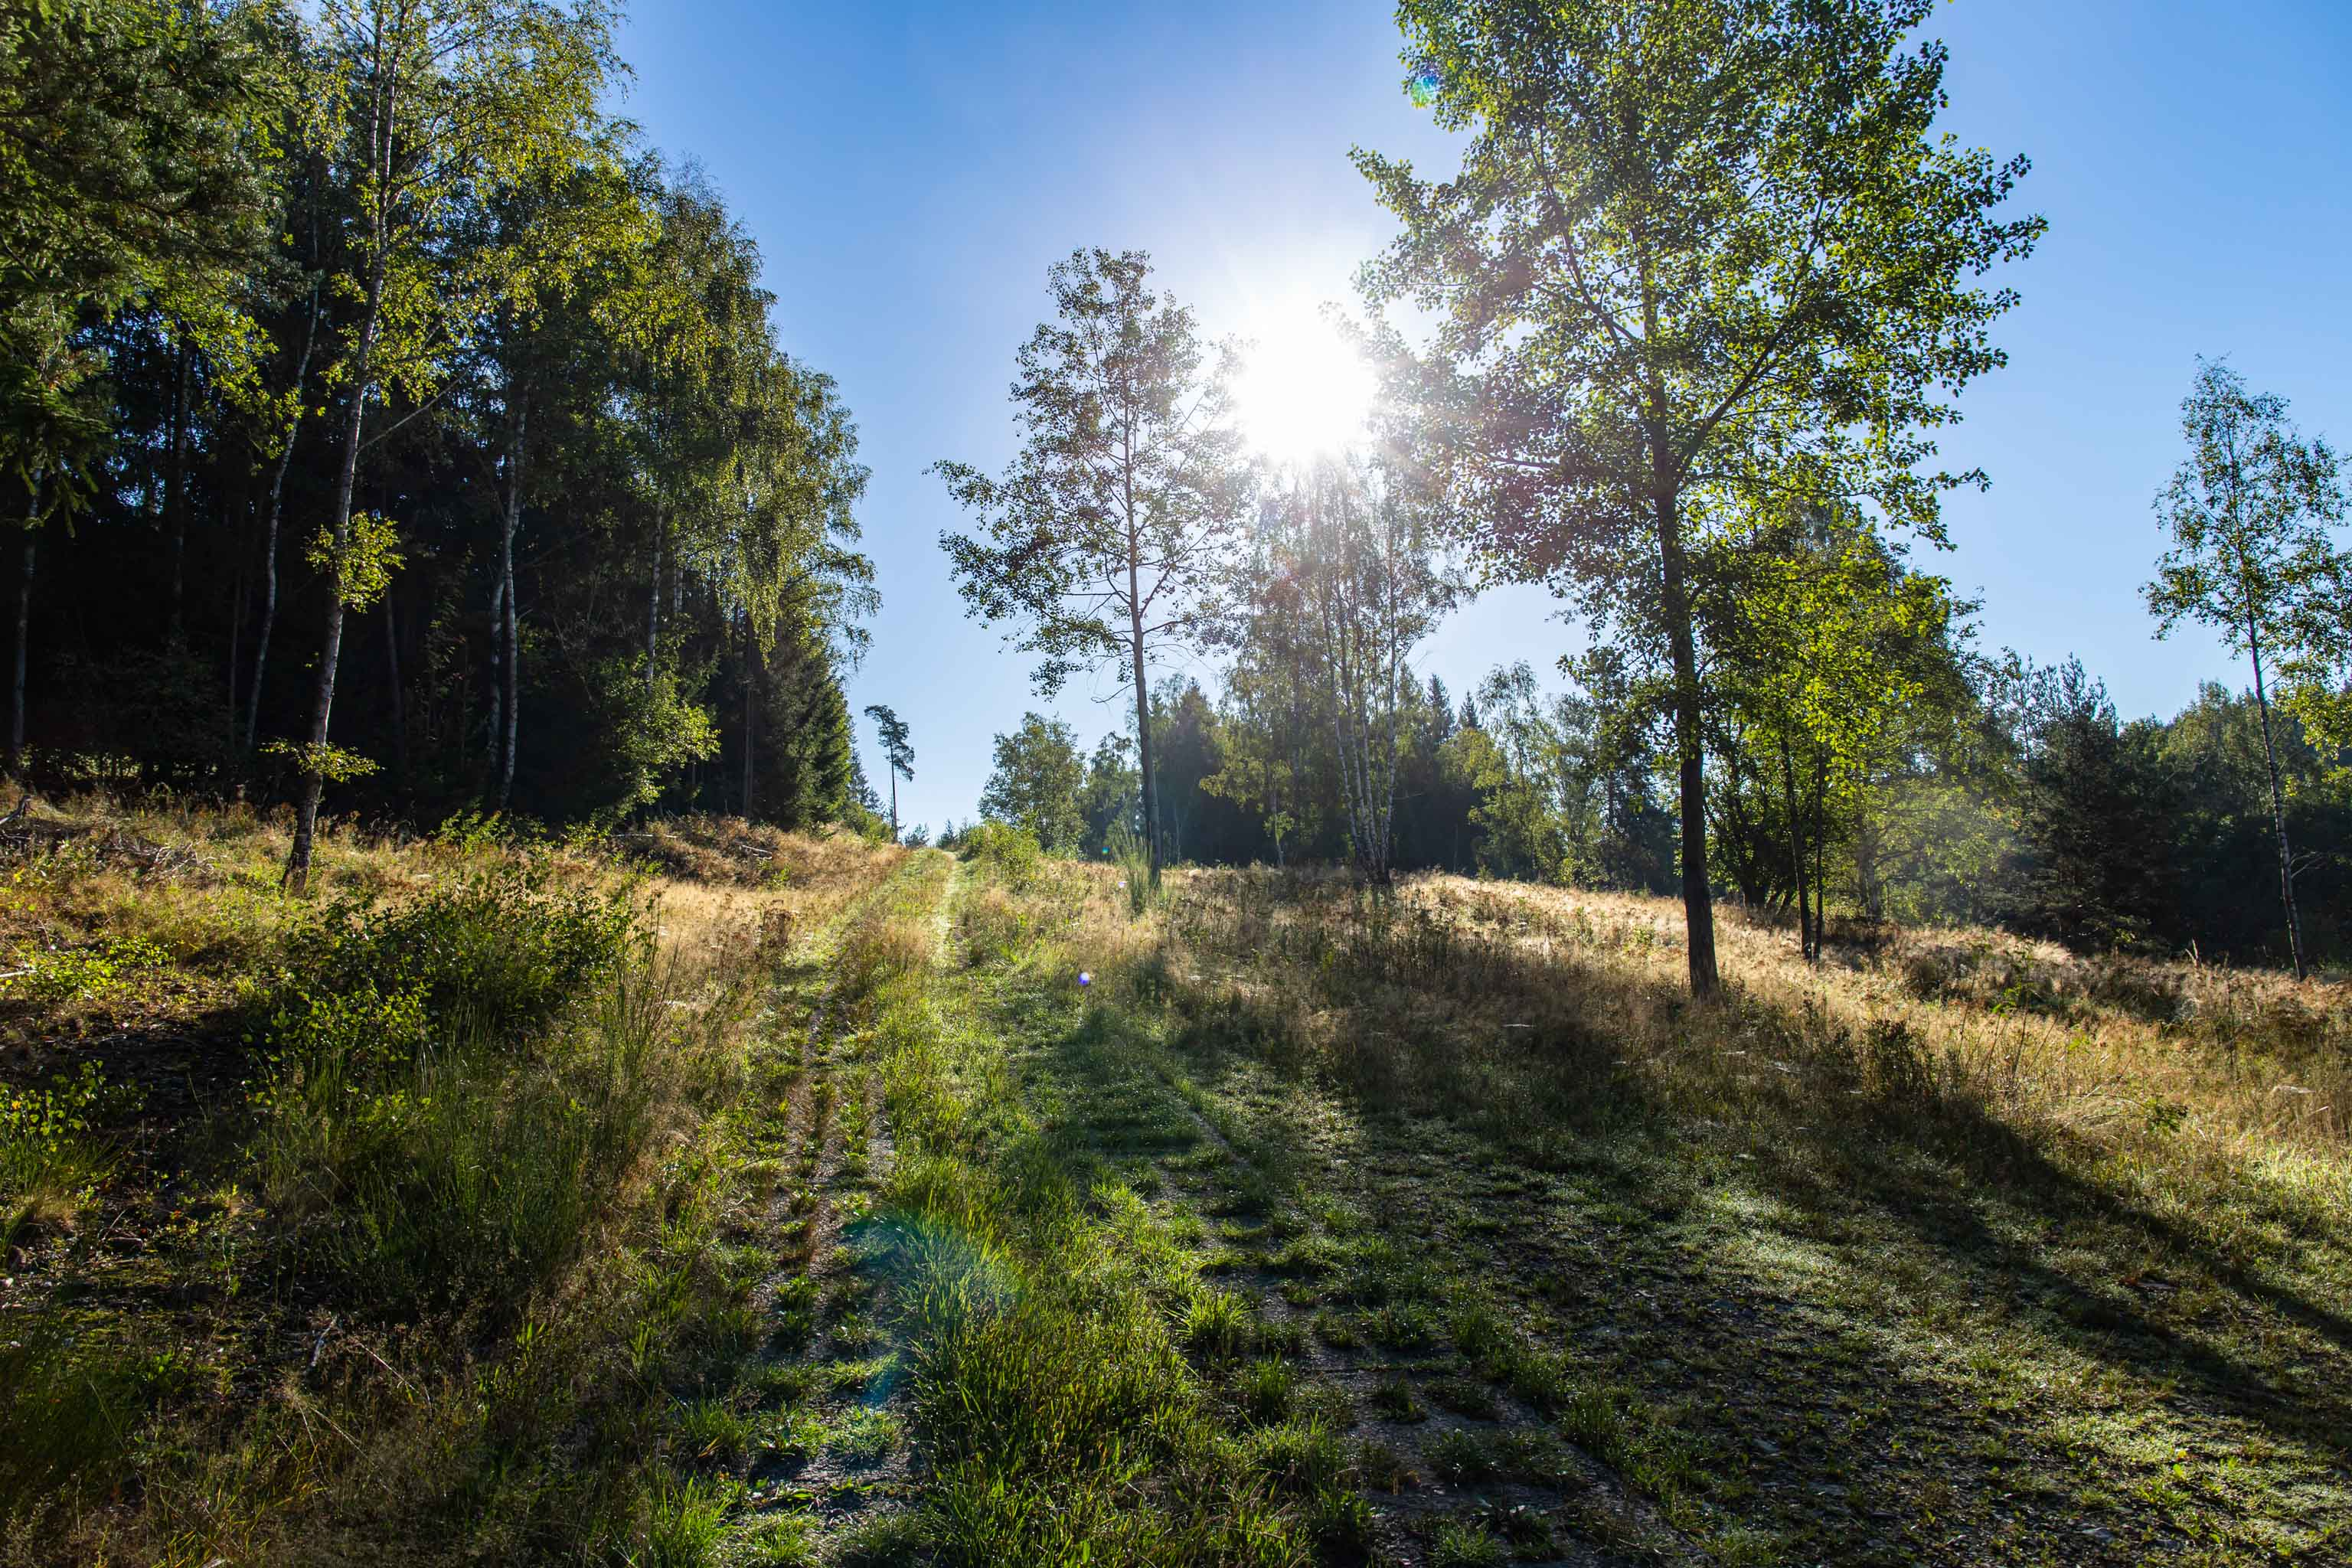 Green Belt army patrol road Kolonnenweg - long distance hiking - hiking trails Germany - hiking in Germany - top trails in Germany